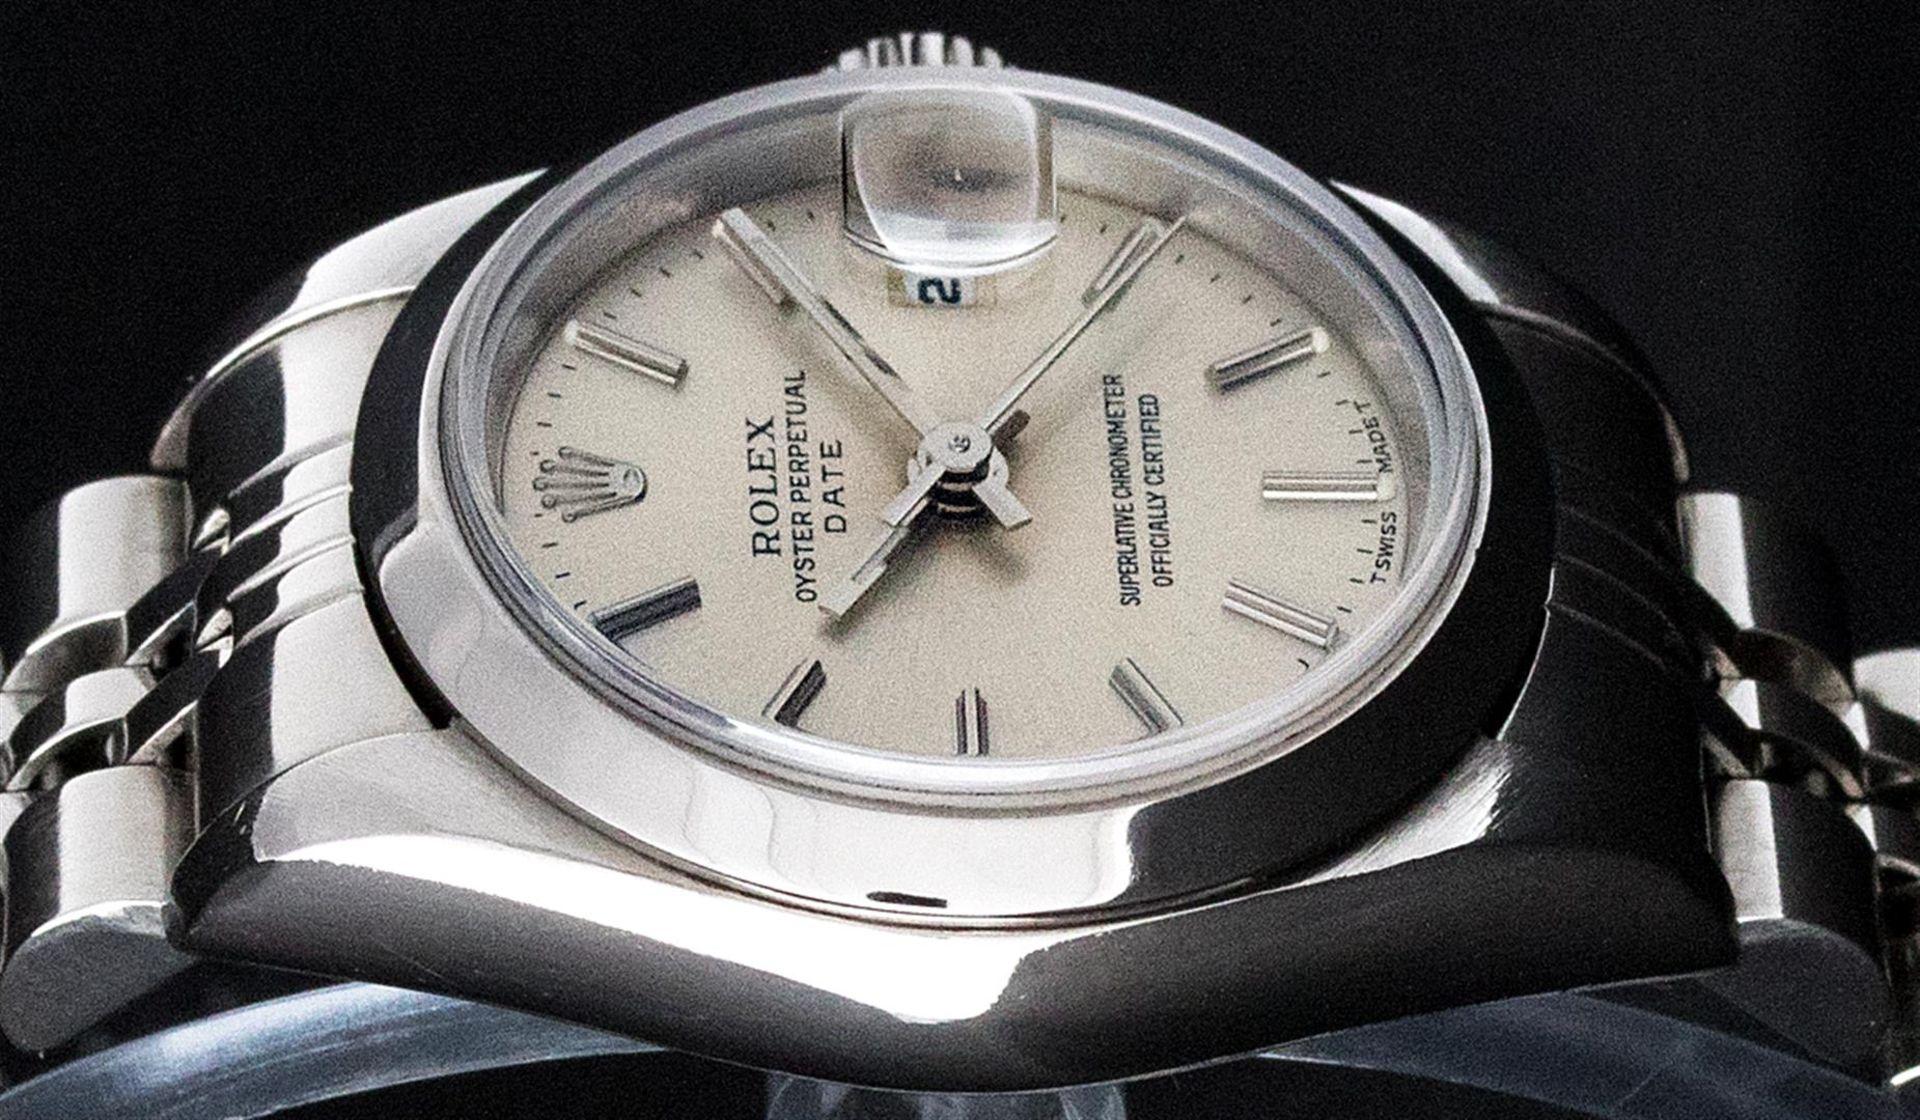 Rolex Ladies Stainless Steel Silver Index 26MM Quickset Datejust Wristwatch - Image 2 of 9